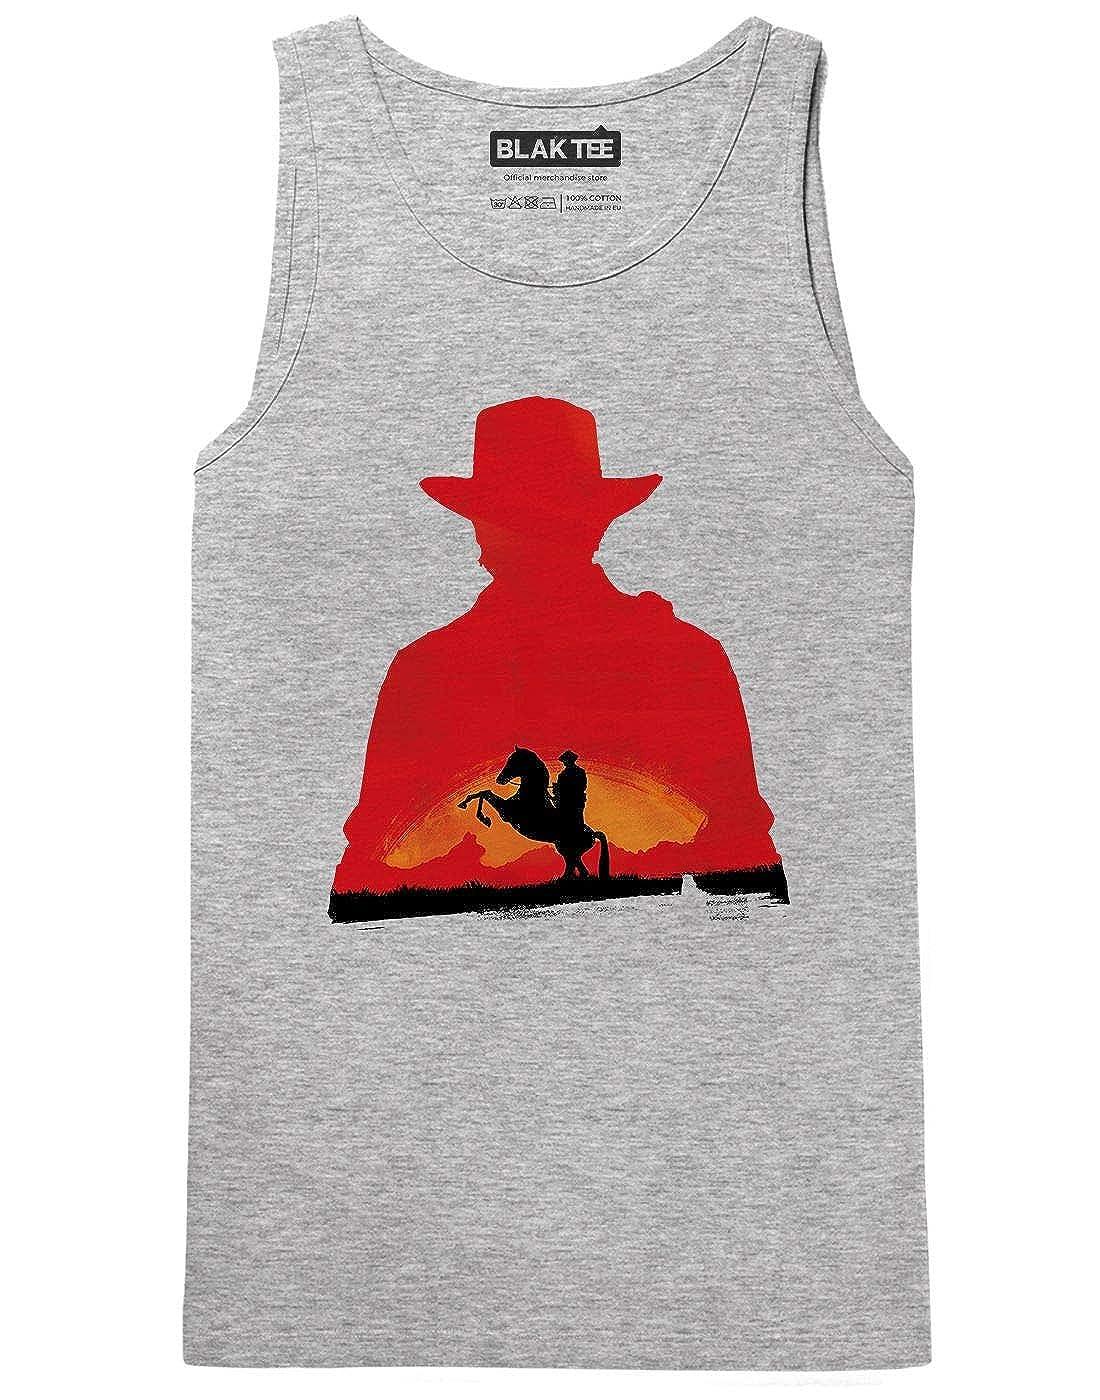 BLAK TEE Video Game Inspired Red Cowboy Redemption RDR2 Femme D/ébardeur Tank Top